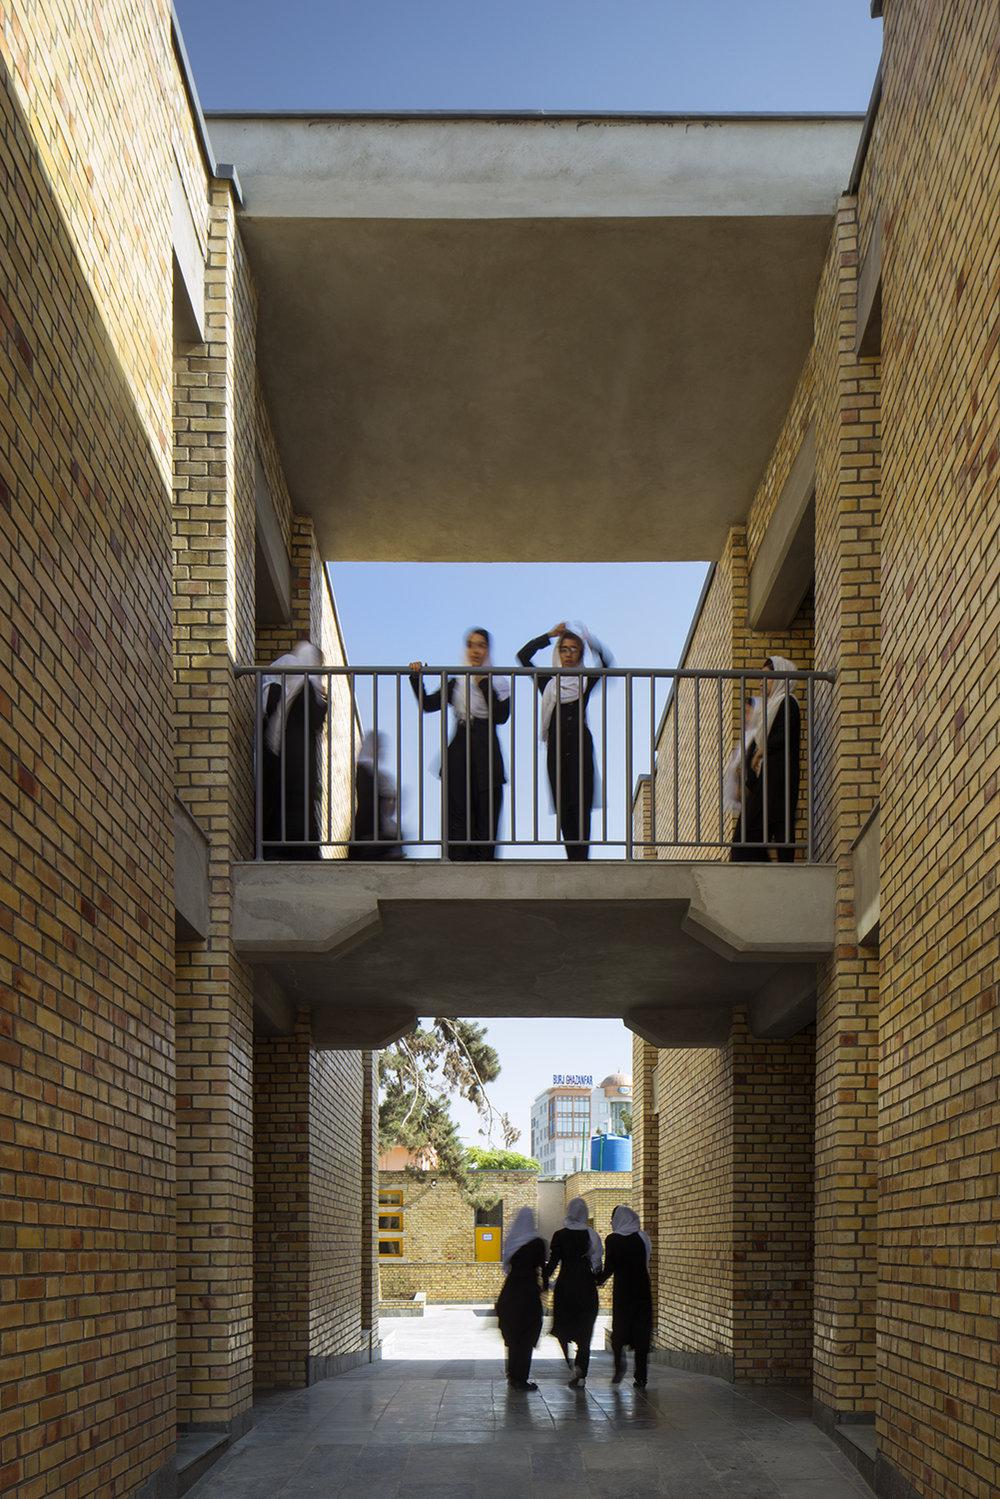 Goharkhatoon Girl School bridges@Nic Lehoux.jpg